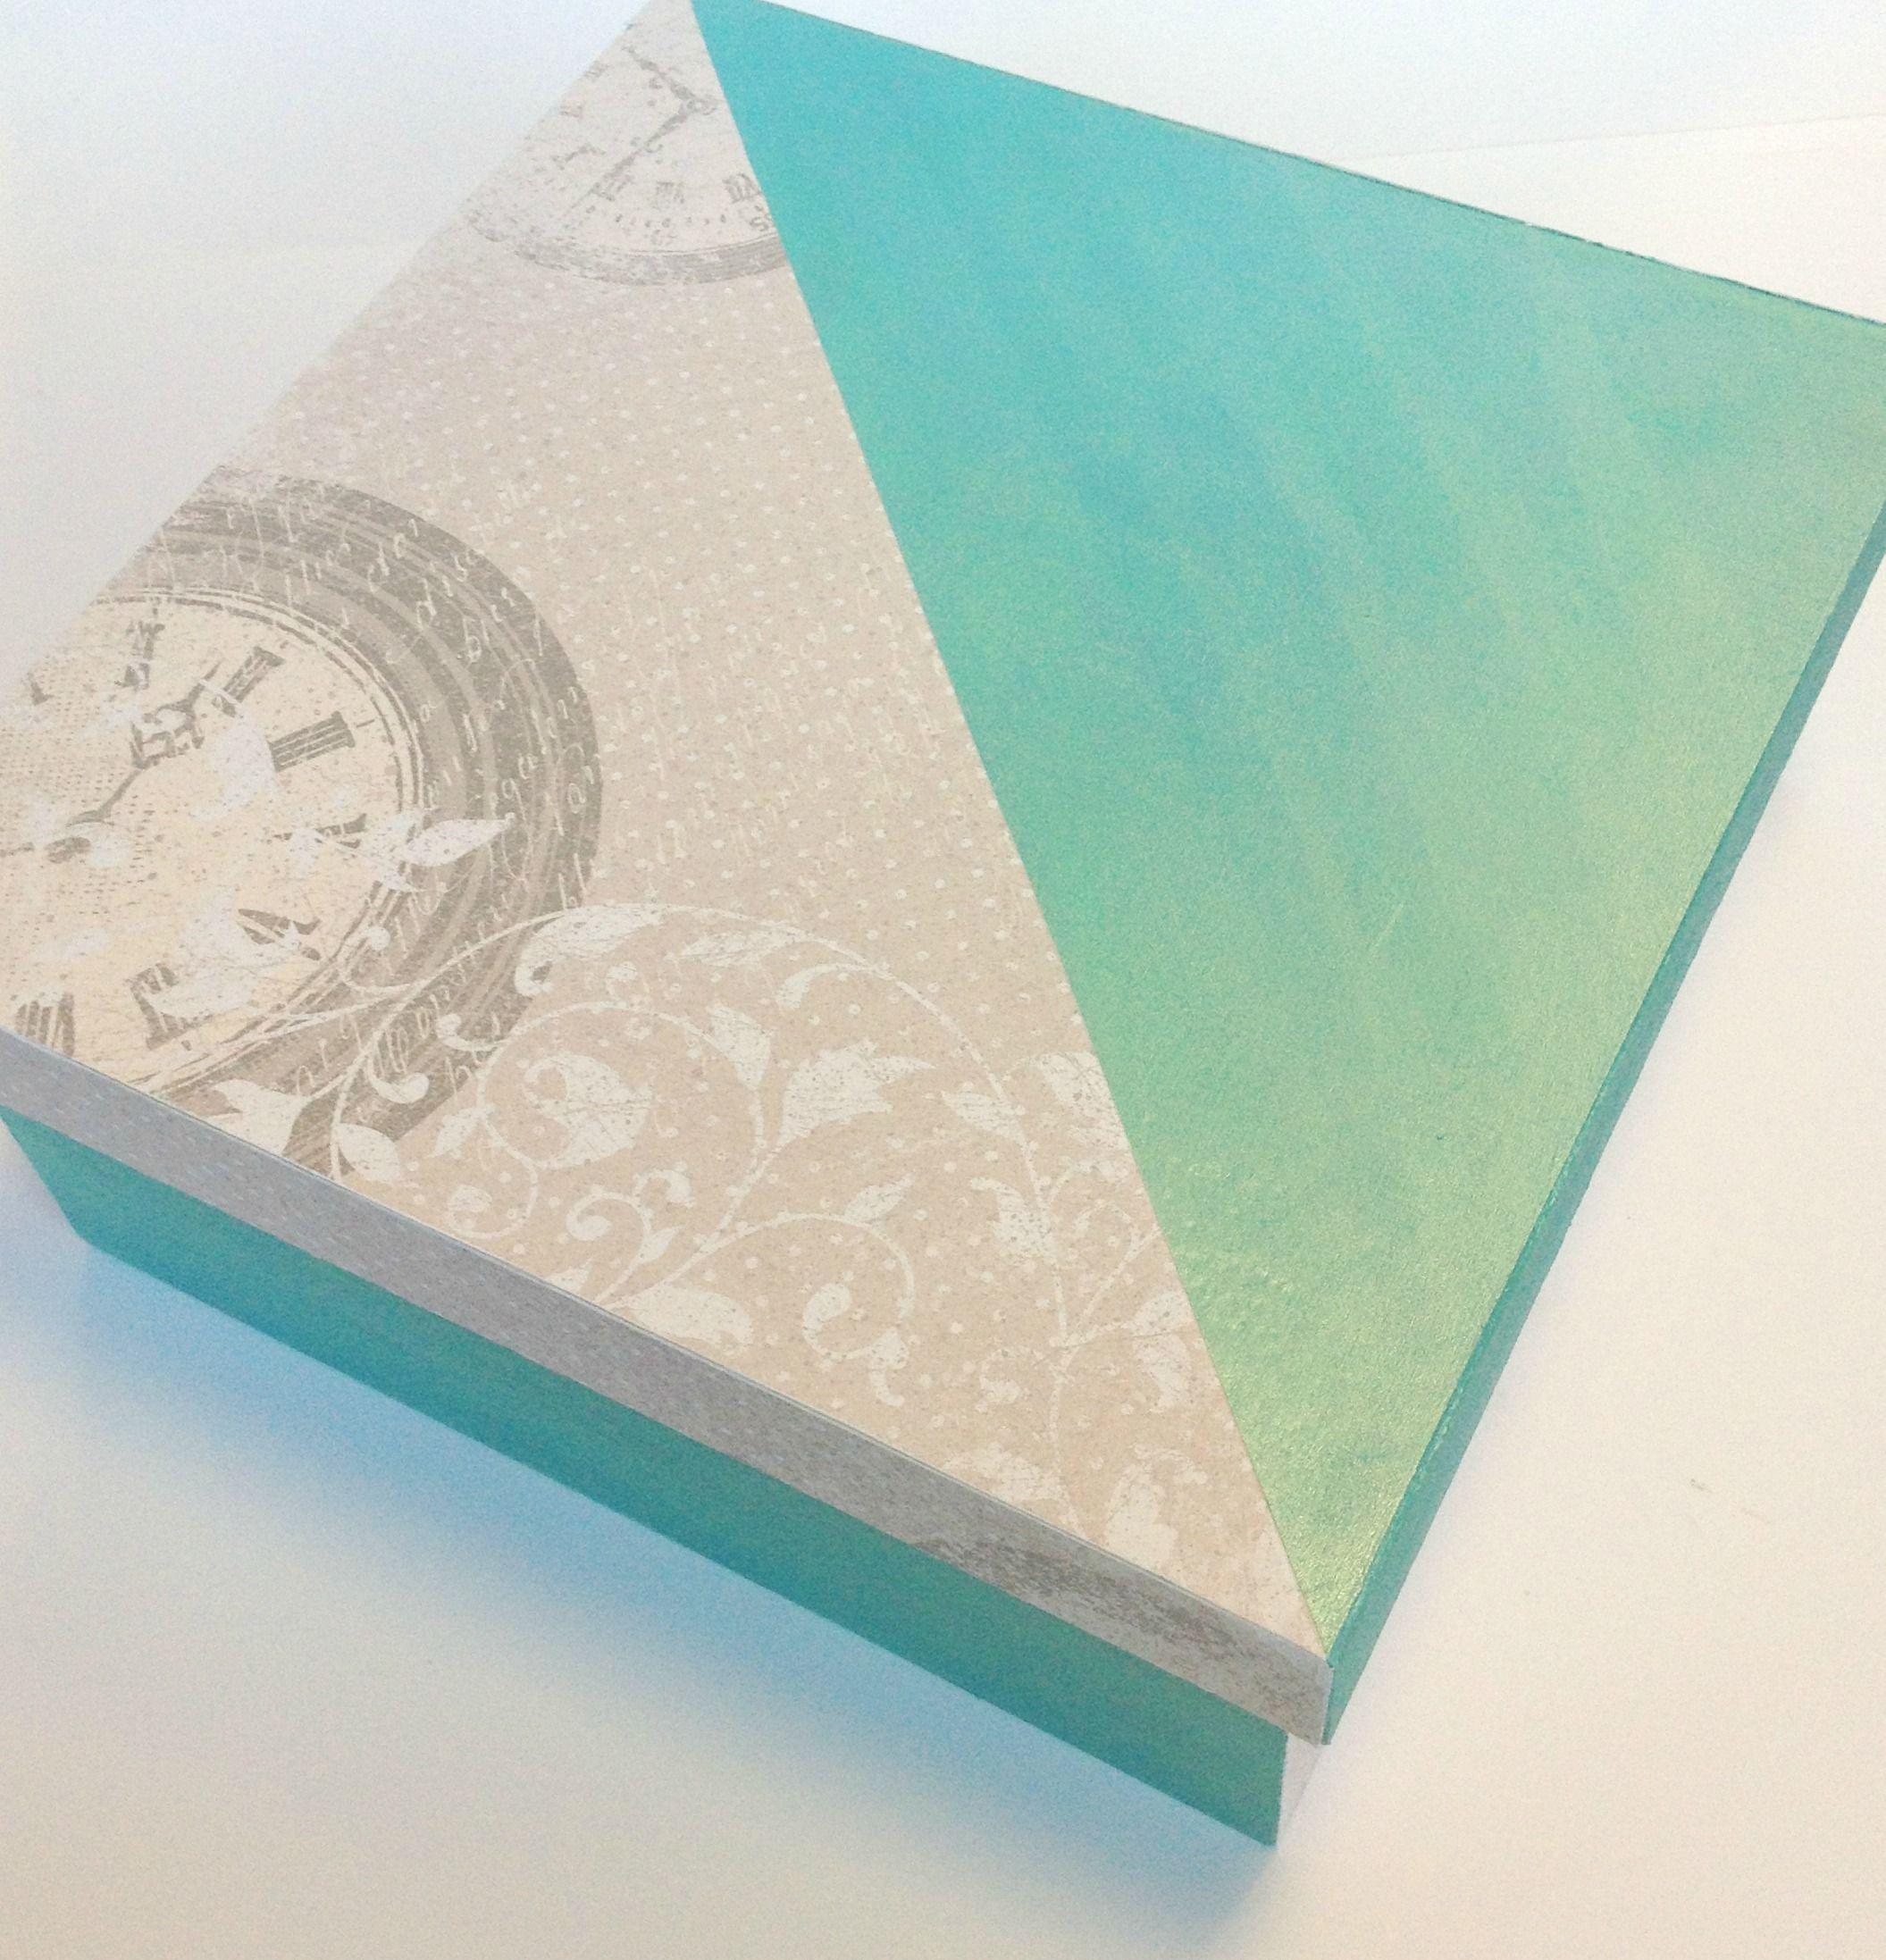 Pack cajas de madera 4/4 decoradas #crafts #manualidades #papel #scrapbook #deco #paint #lumiere #turquesa #perlado